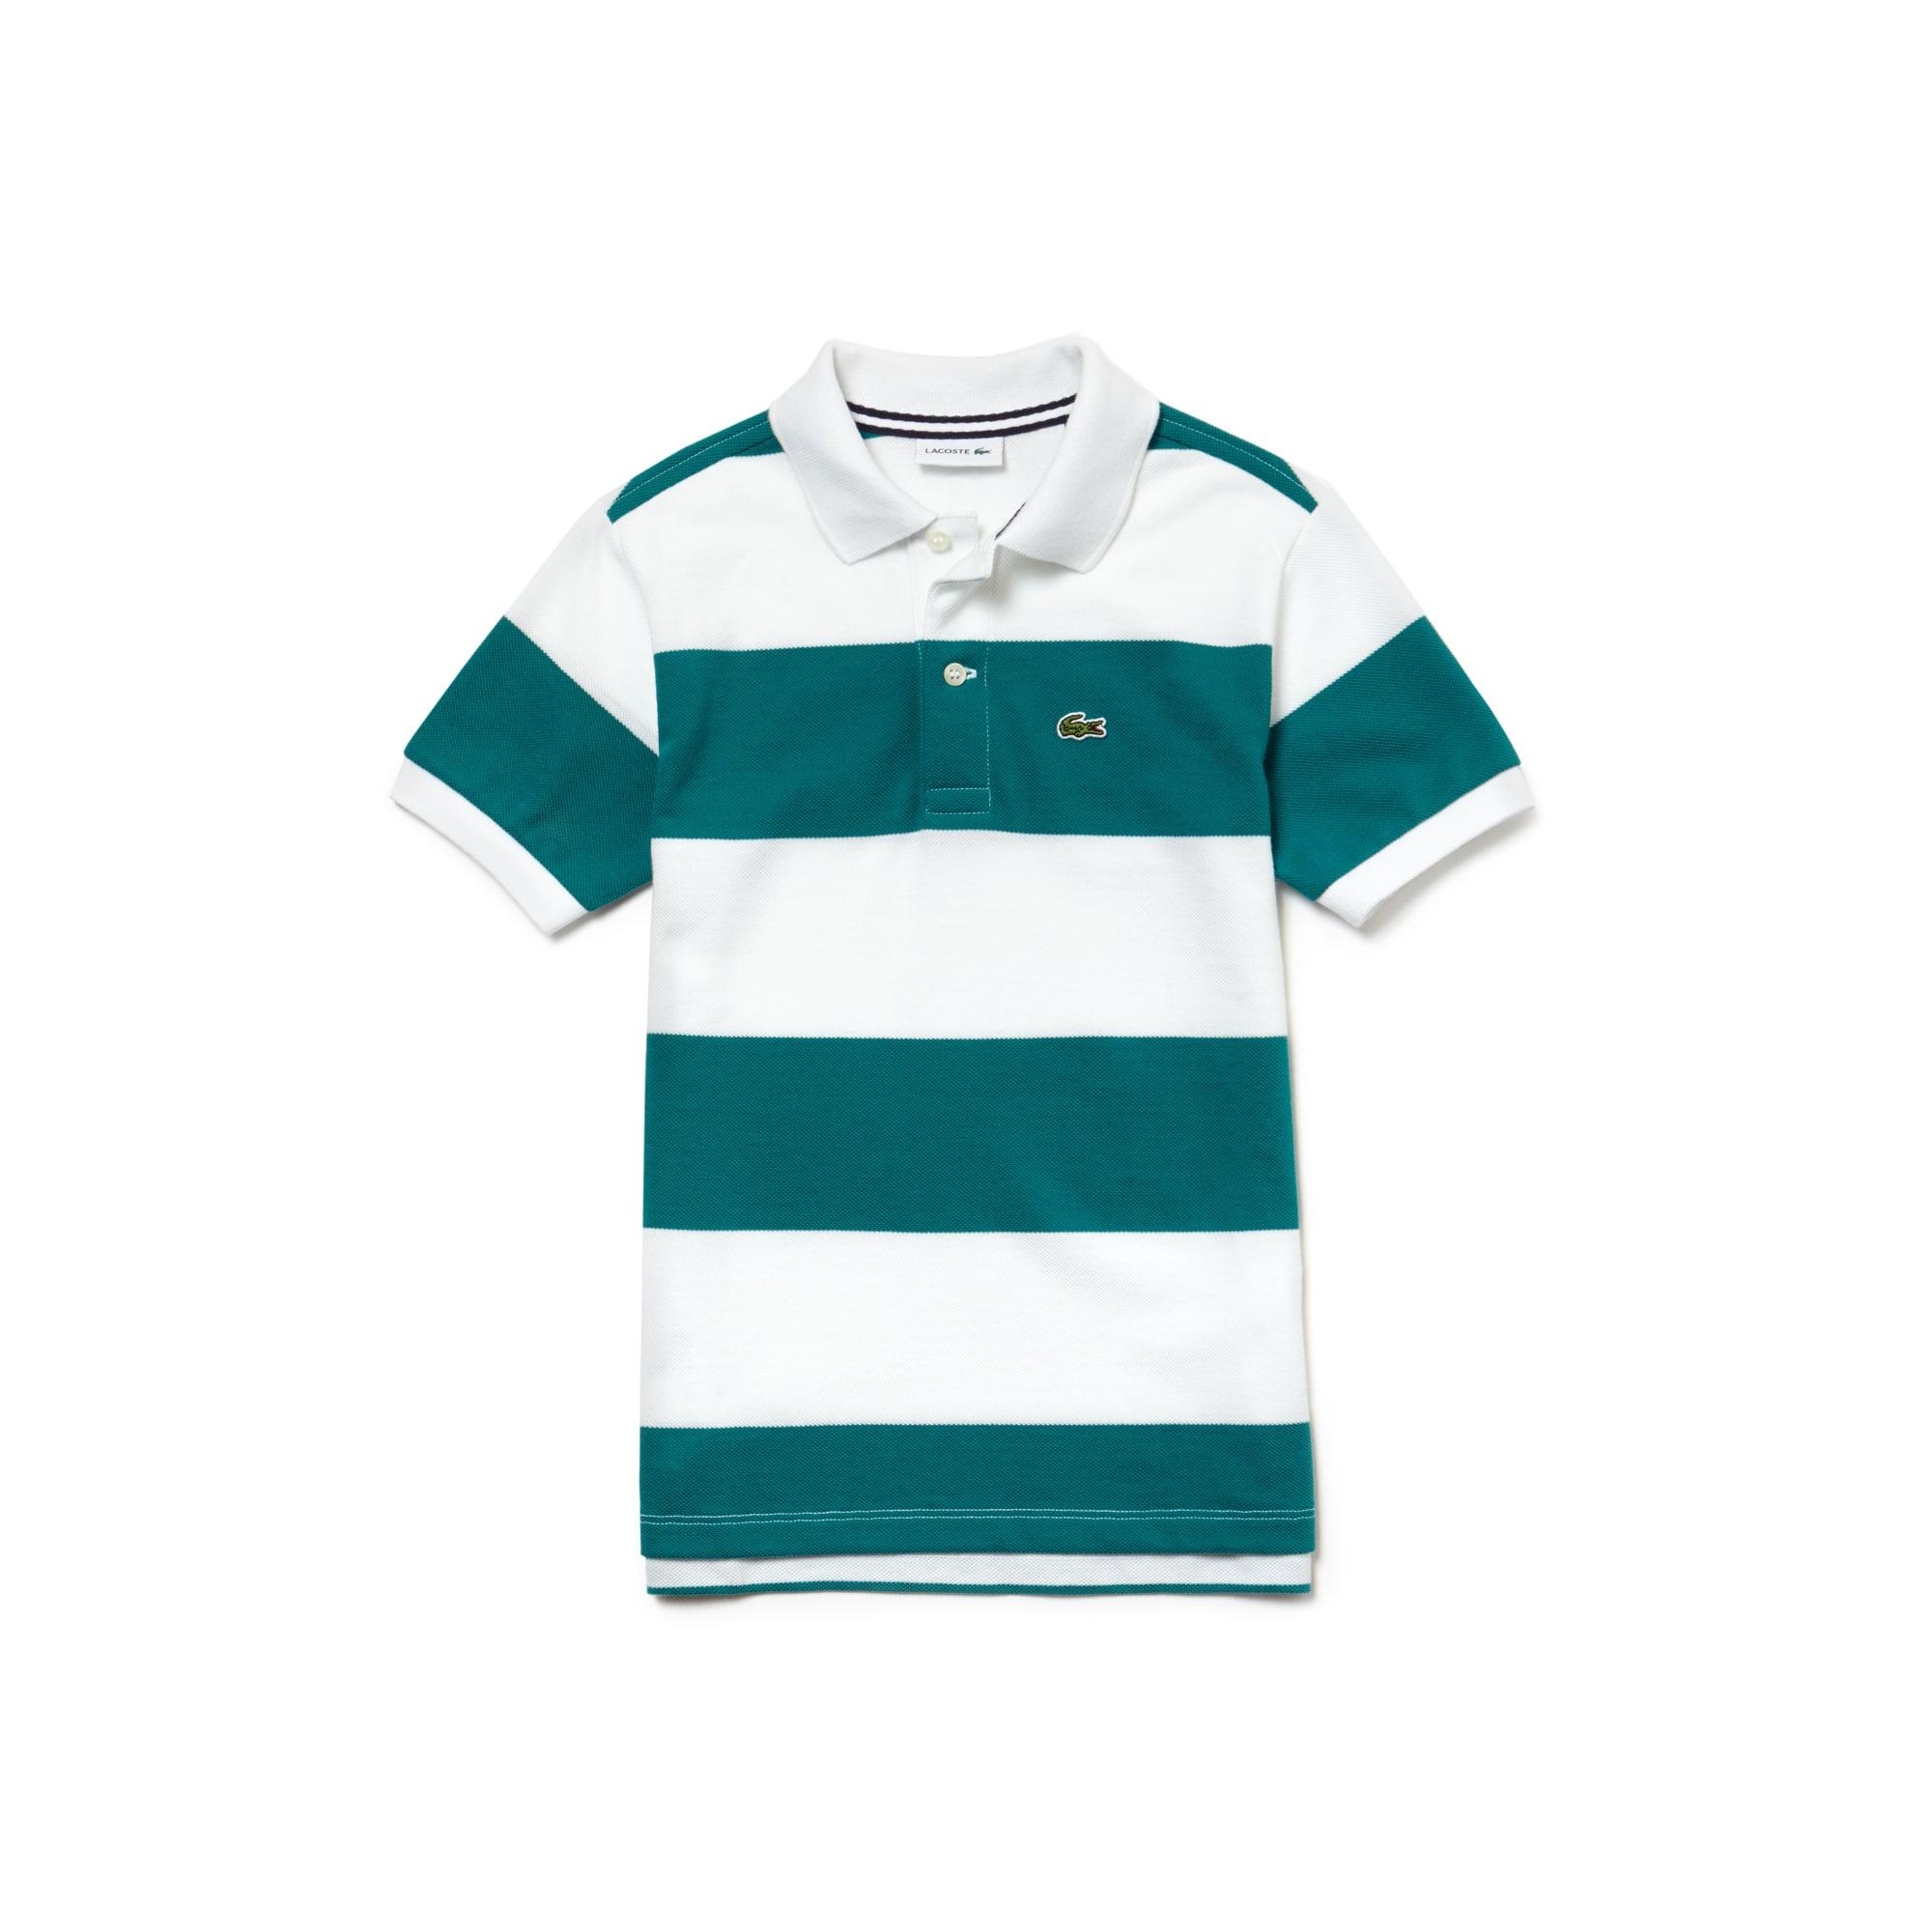 e914b660a Boys  Lacoste Striped Cotton Petit Piqué Polo Shirt